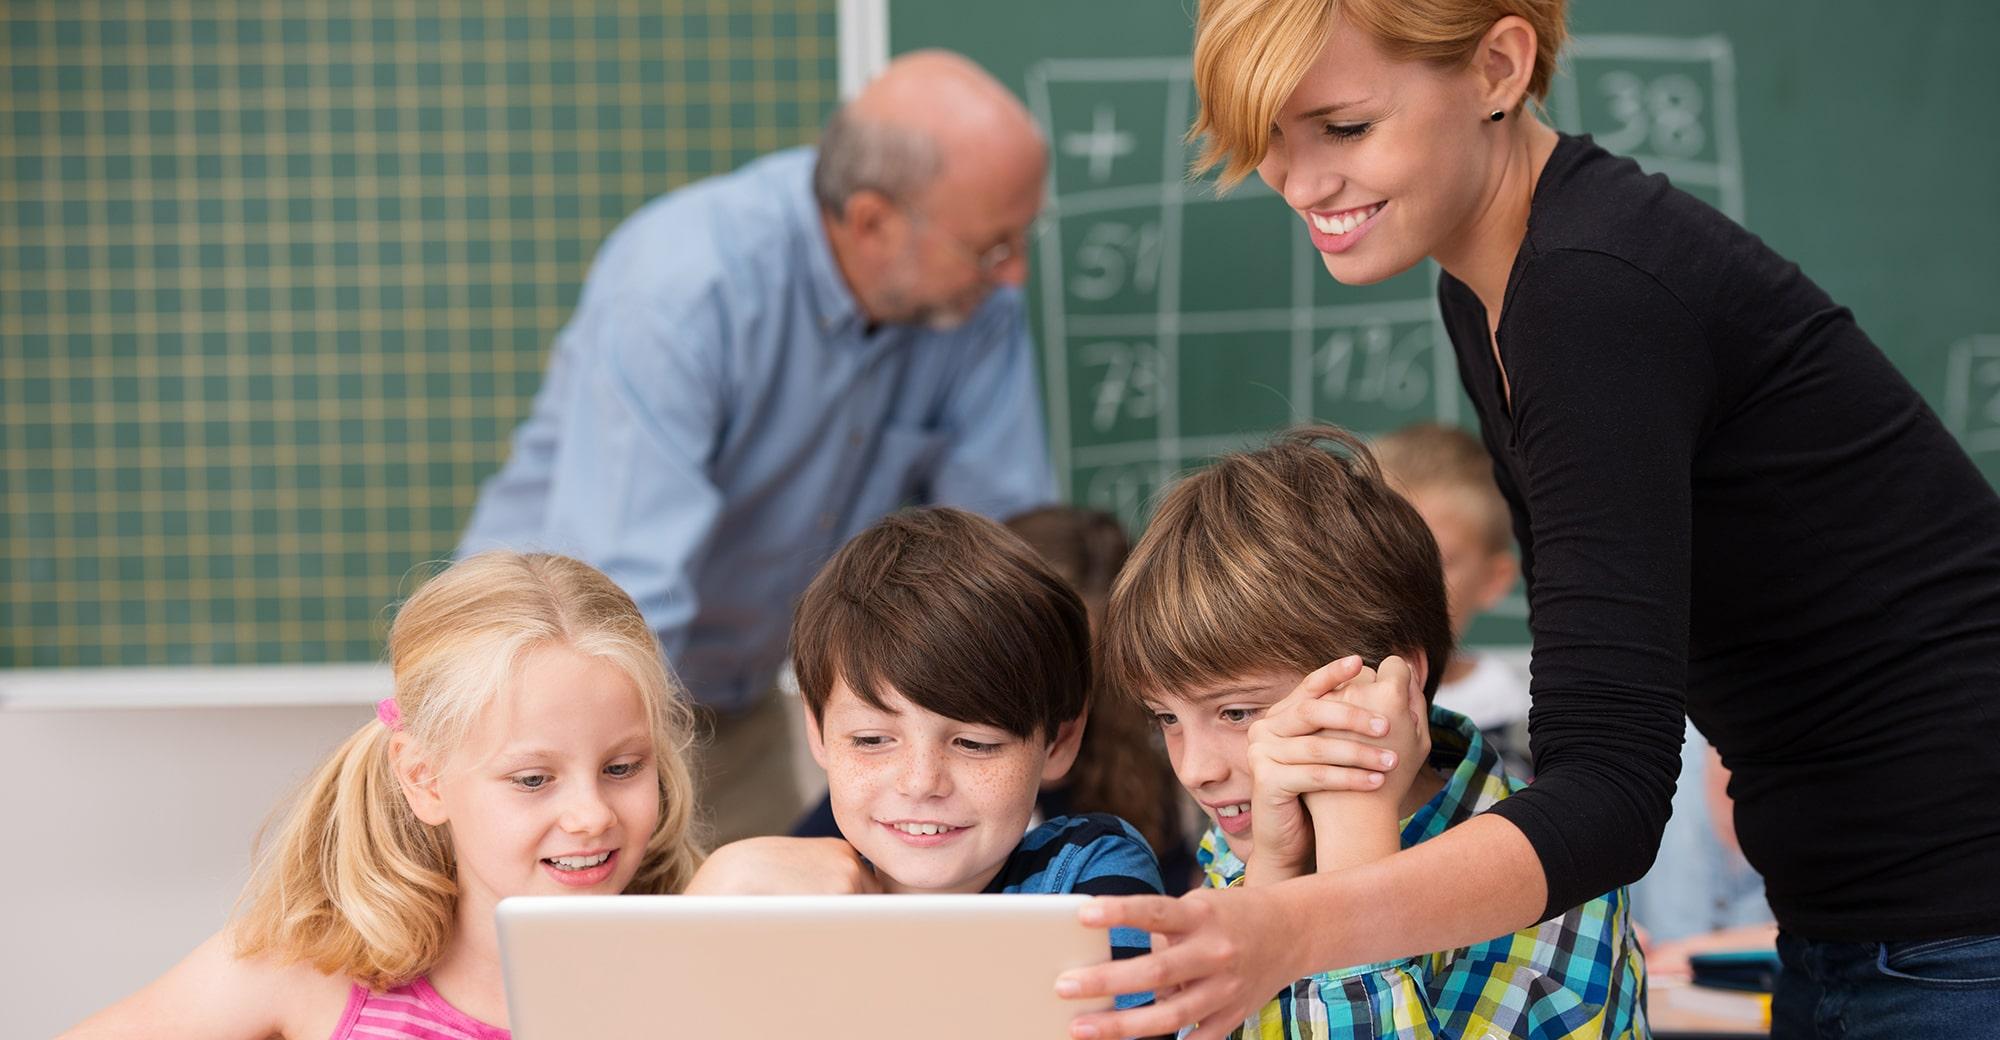 Kinder und Lehrerin mit Tablet, Foto: contrastwerkstatt – stock.adobe.com